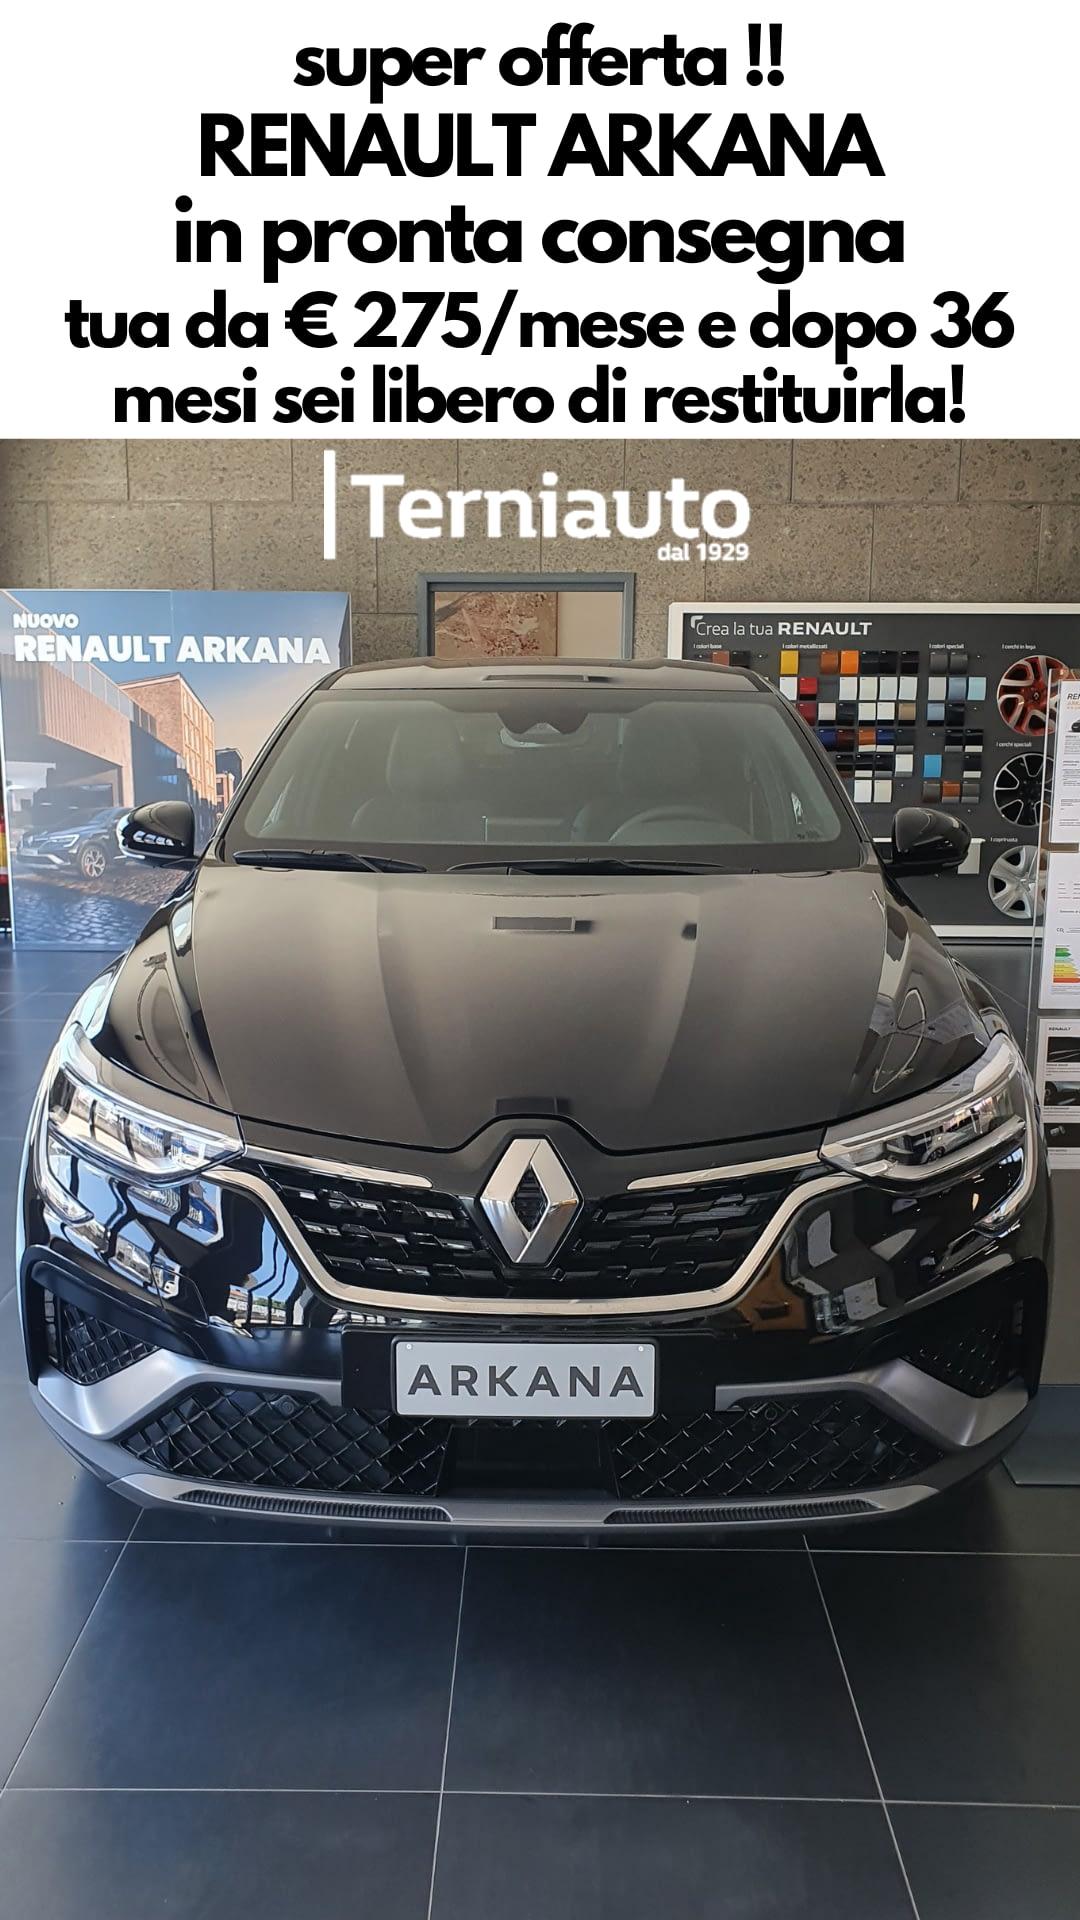 Offerta Renault Arkana Terni